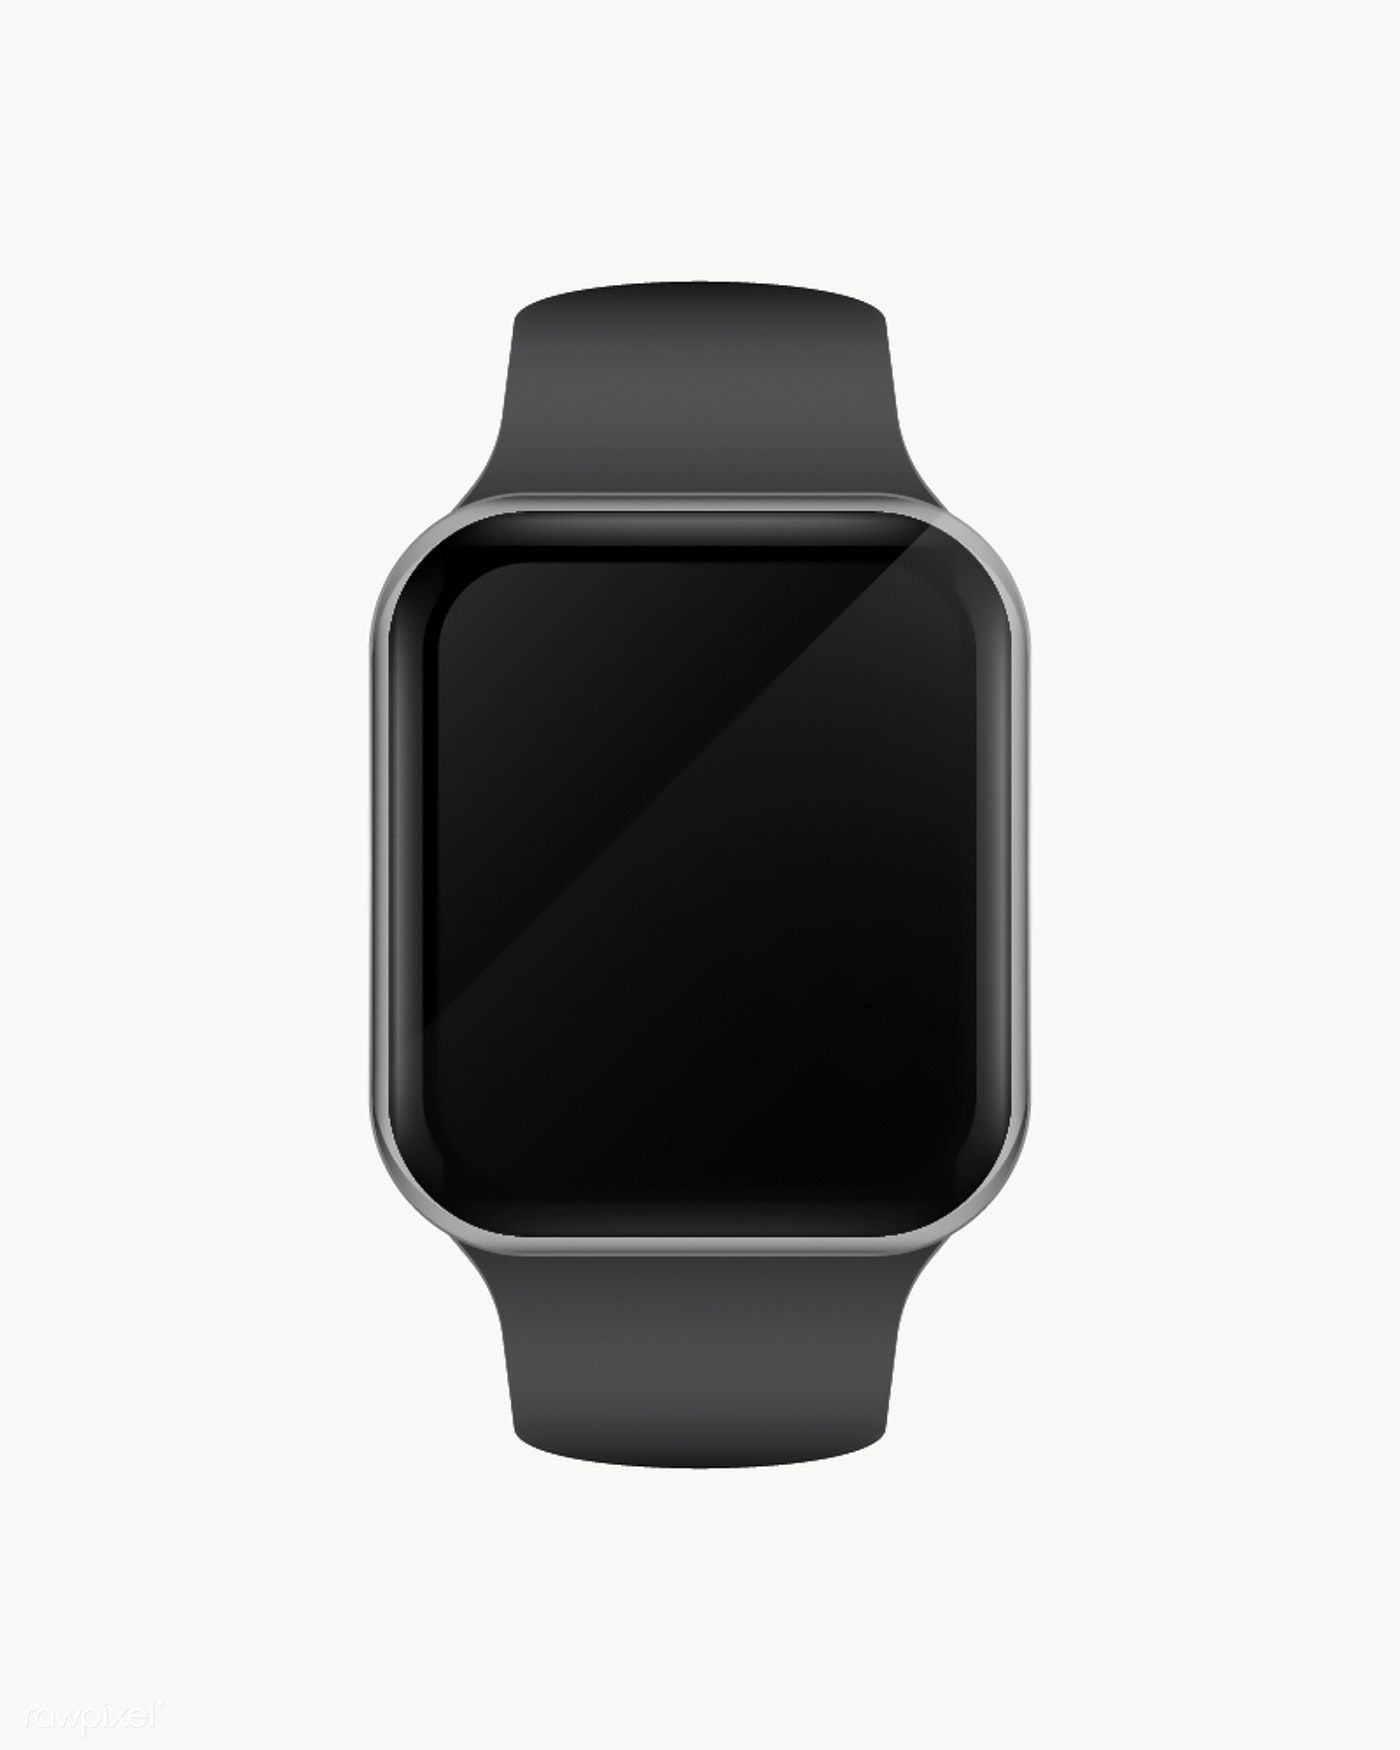 Black Watch Screen Template Transparent Png Premium Image By Rawpixel Com Eyeeyeview Phone Template Digital Tablet Design Mockup Free